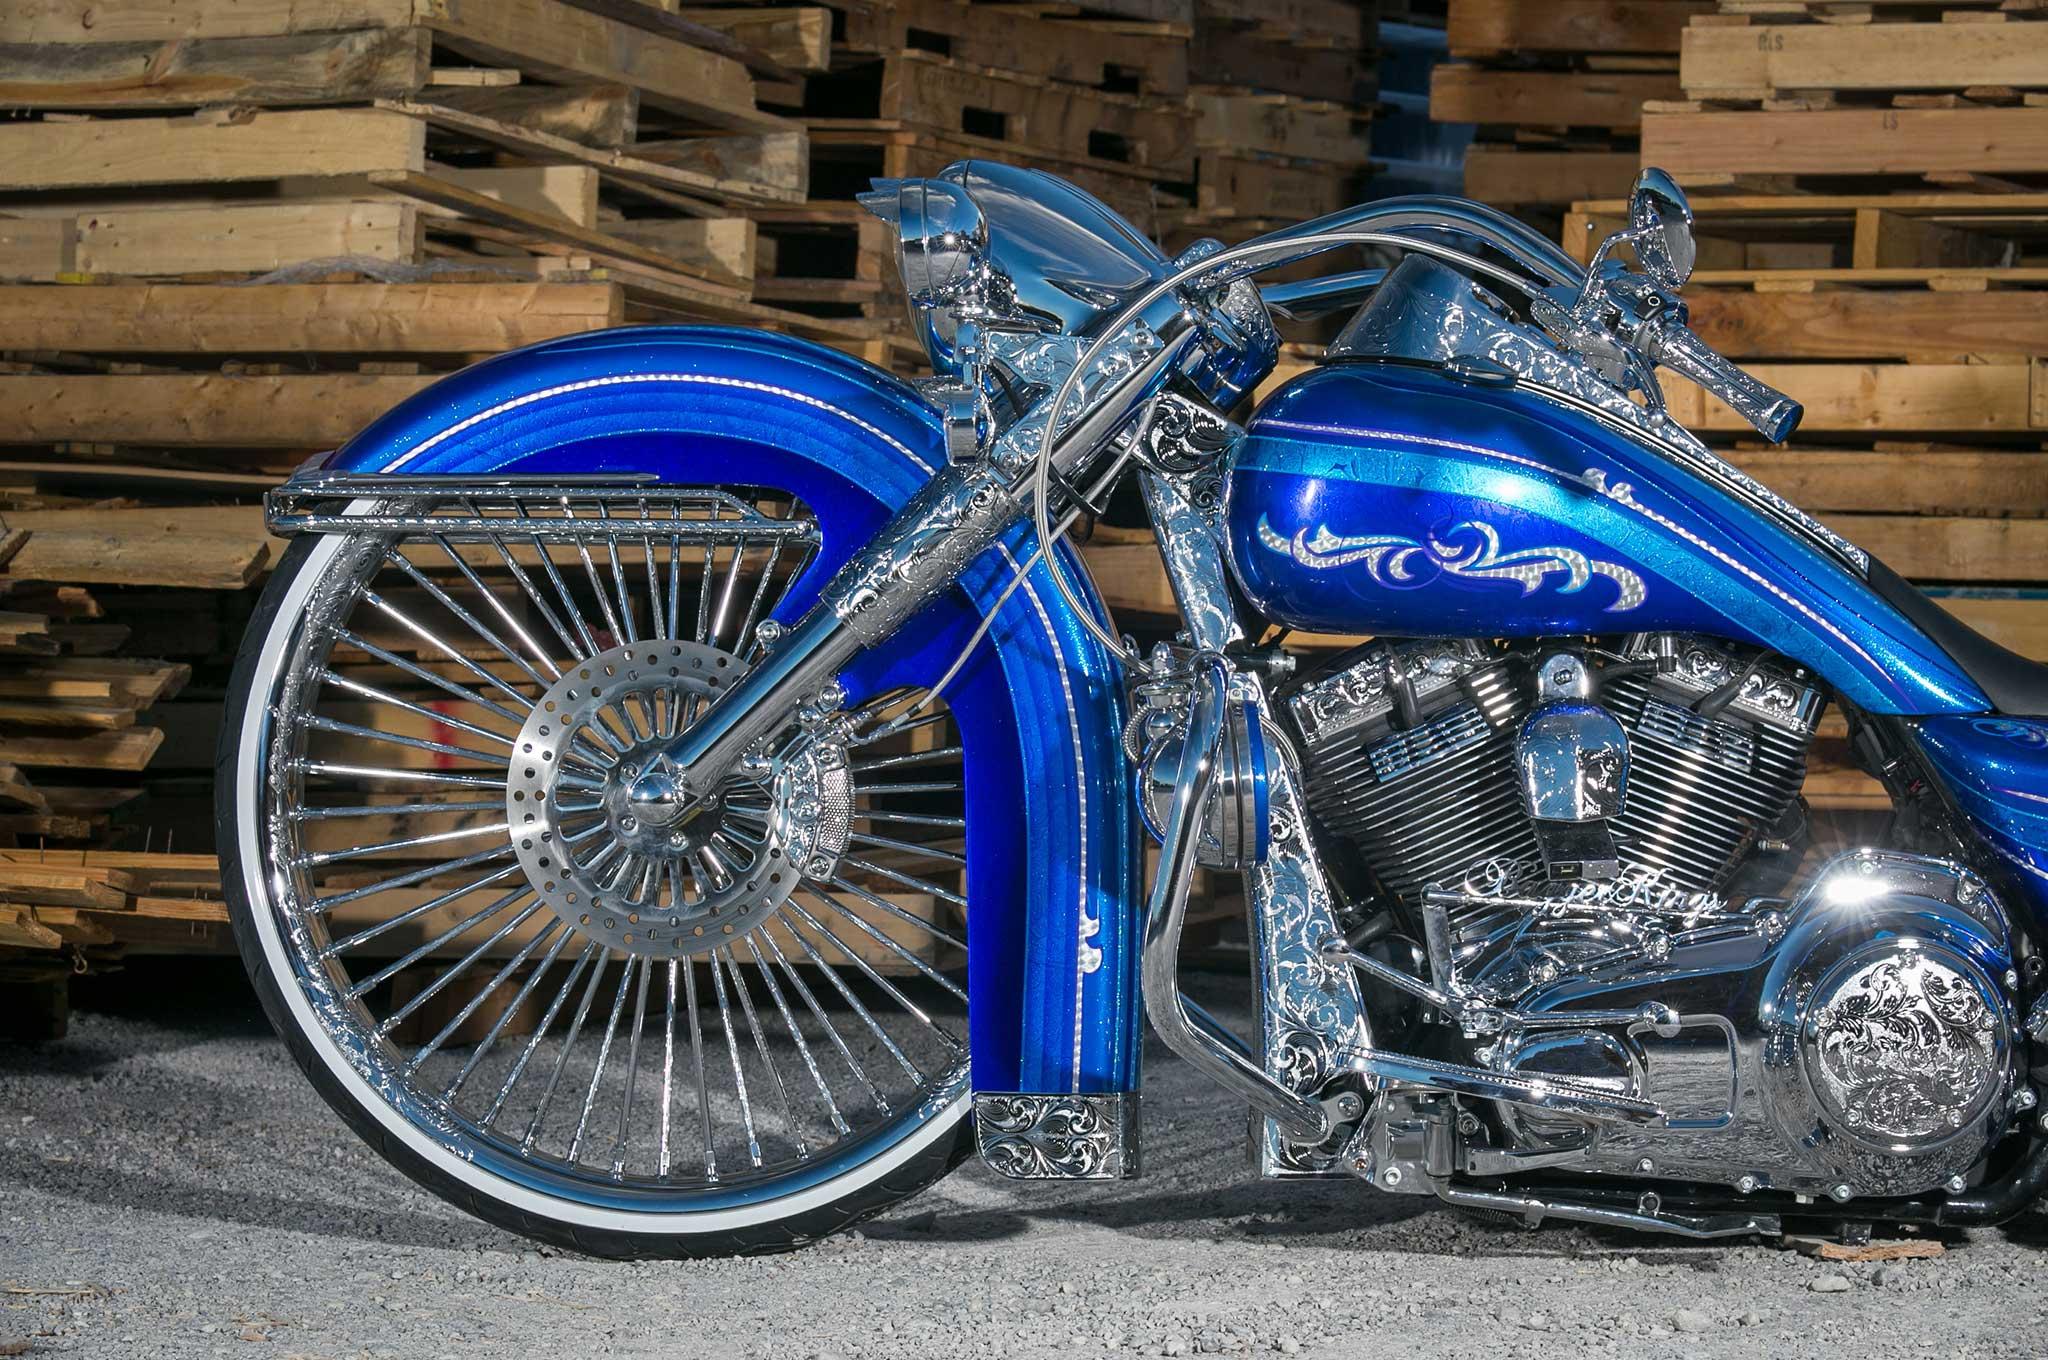 30 Inch Motorcycle Wheels : Harley davidson road king show winner